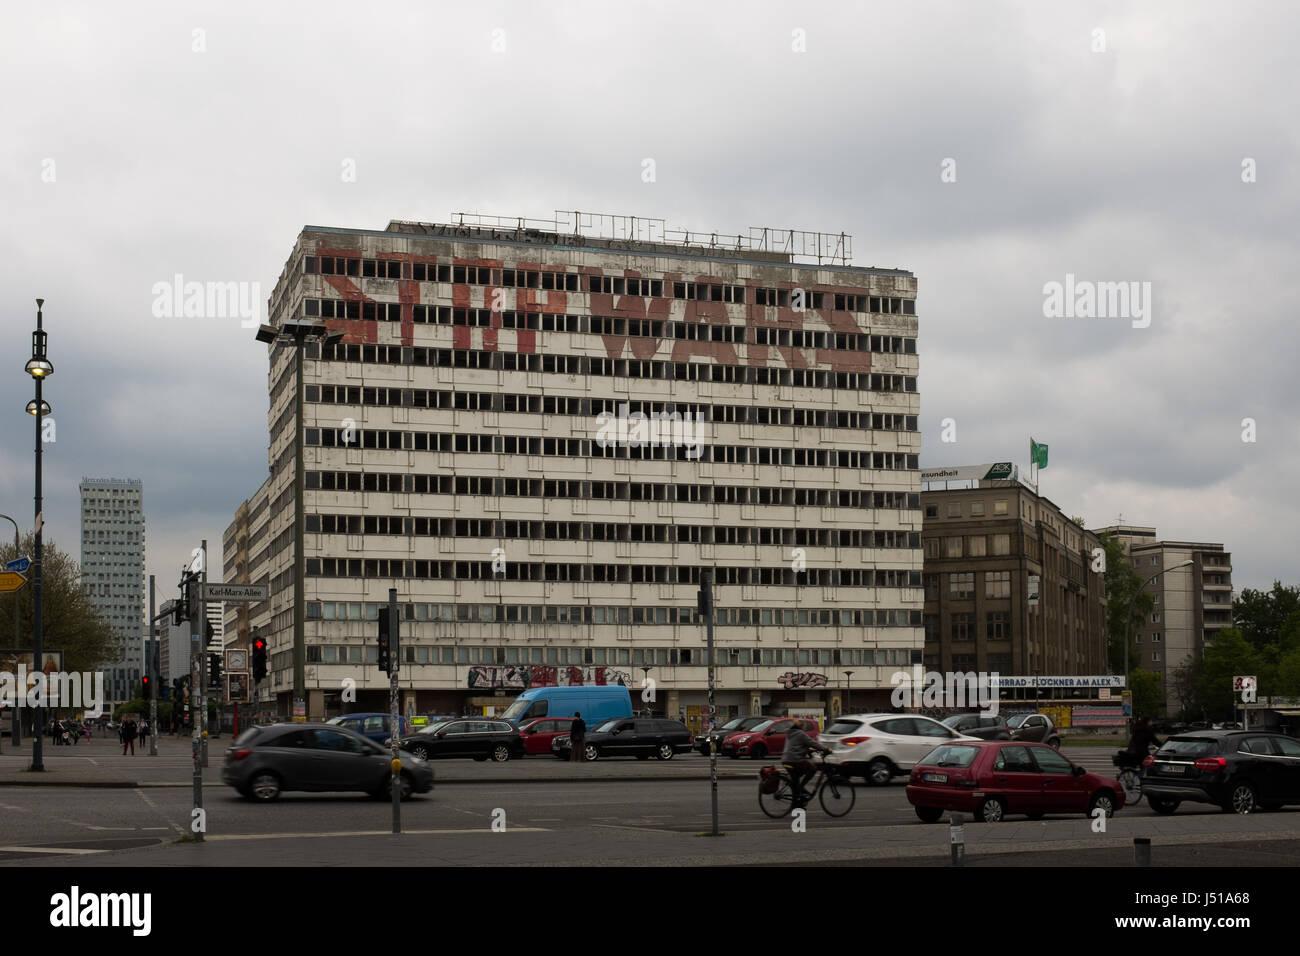 Berlin May 3th Abandoned Building Haus Der Statistik German For